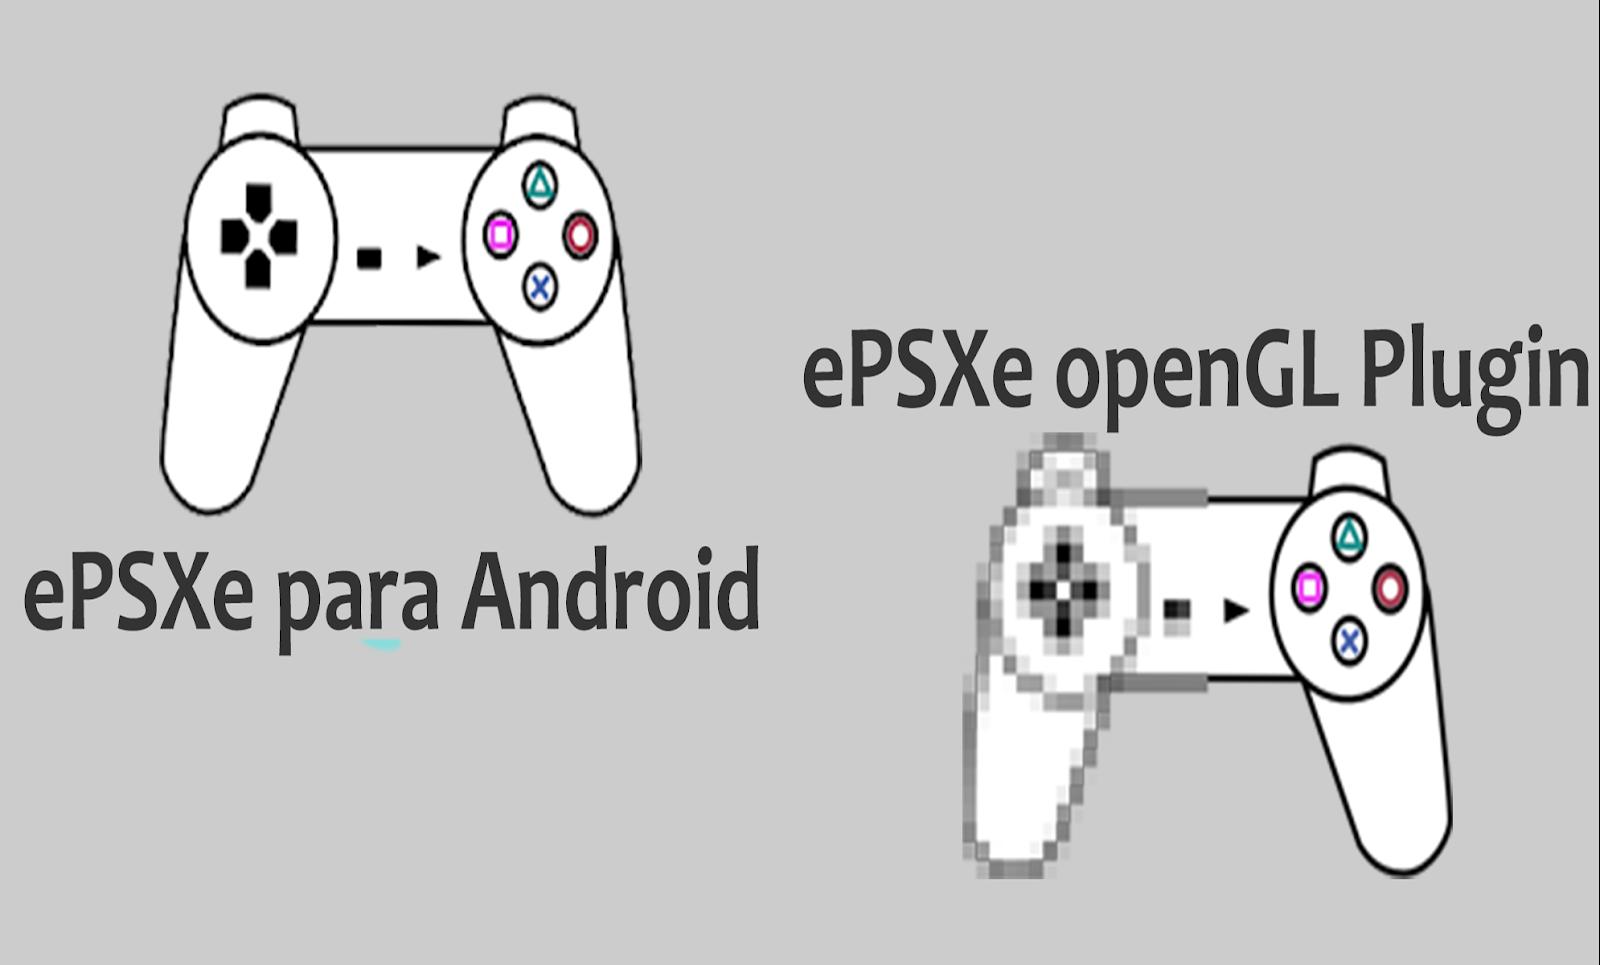 Emulador ePSXe para Android + openGL Plugin  - DroidBlog